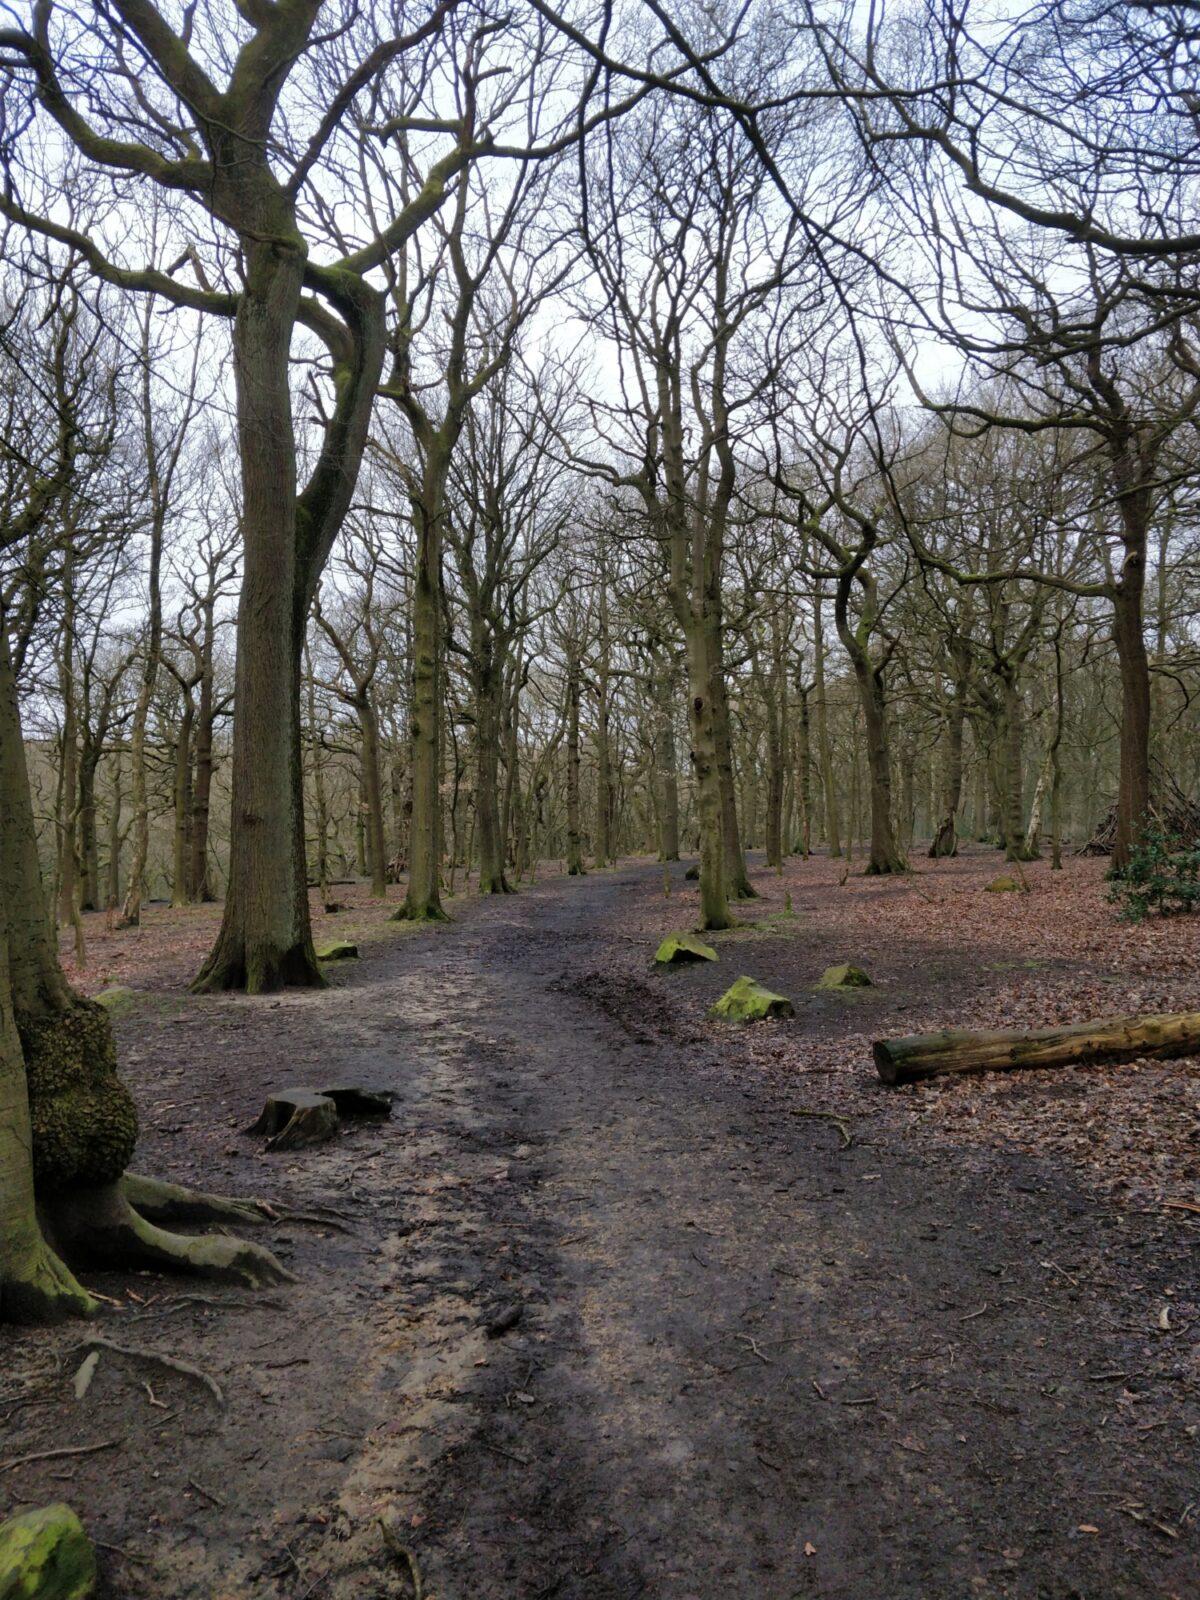 Northcliffe Woods, Shipley large photo 5